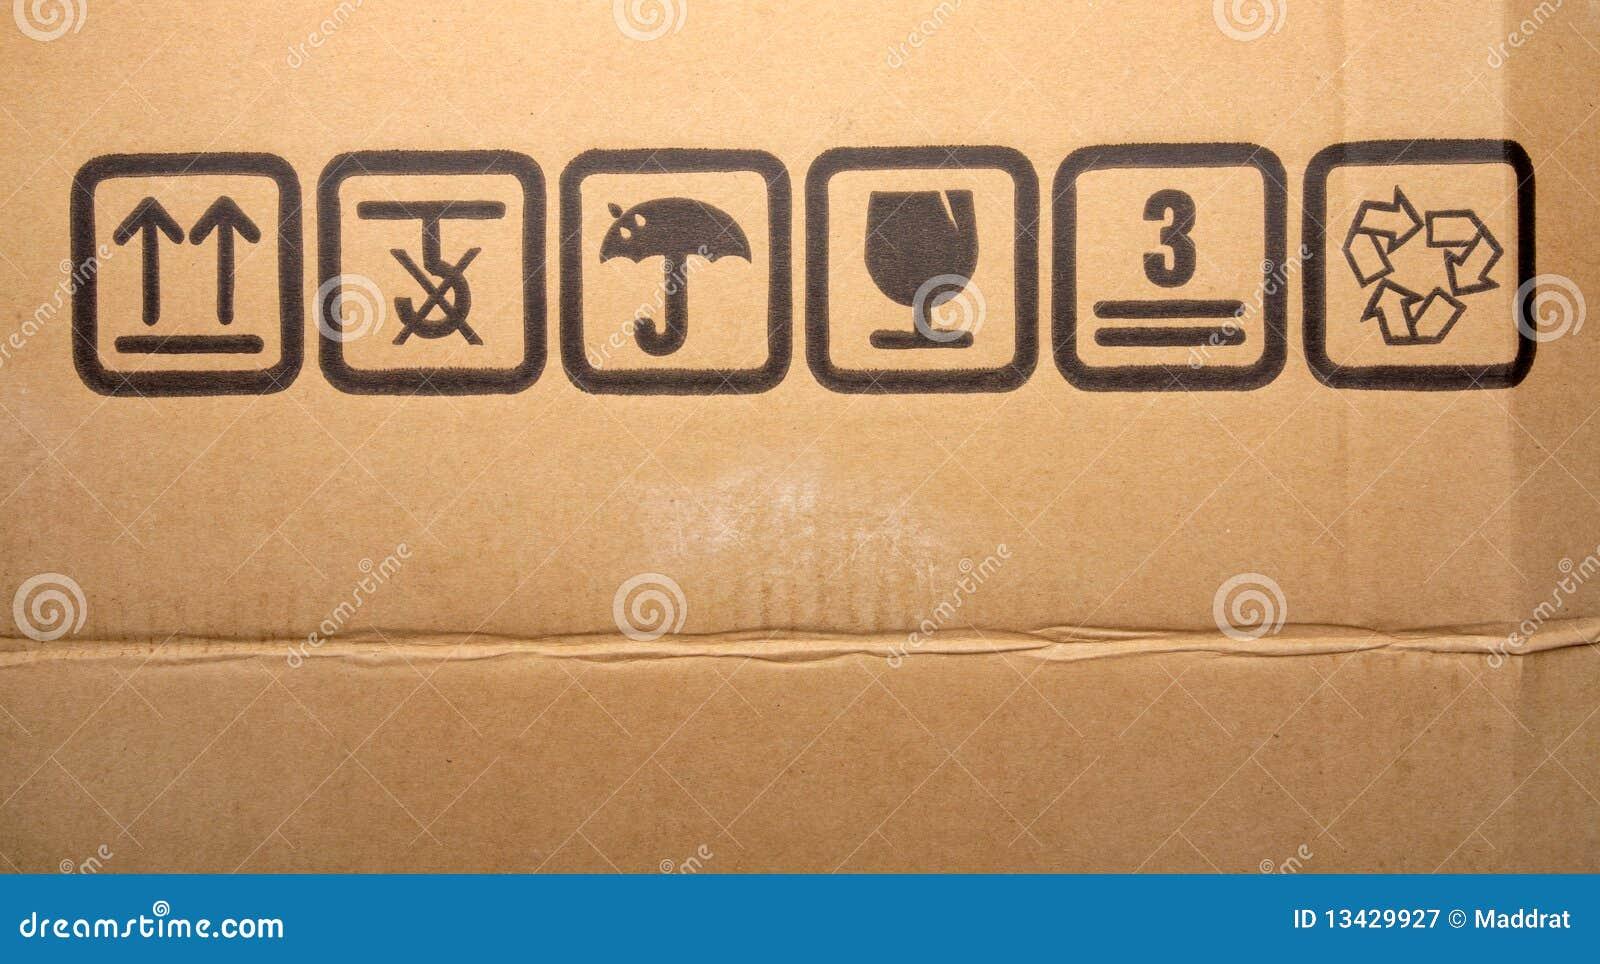 Cardboard box symbols stock photos 193 images cardboard box symbols fine image close up of grunge black fragile symbol on cardboard biocorpaavc Choice Image